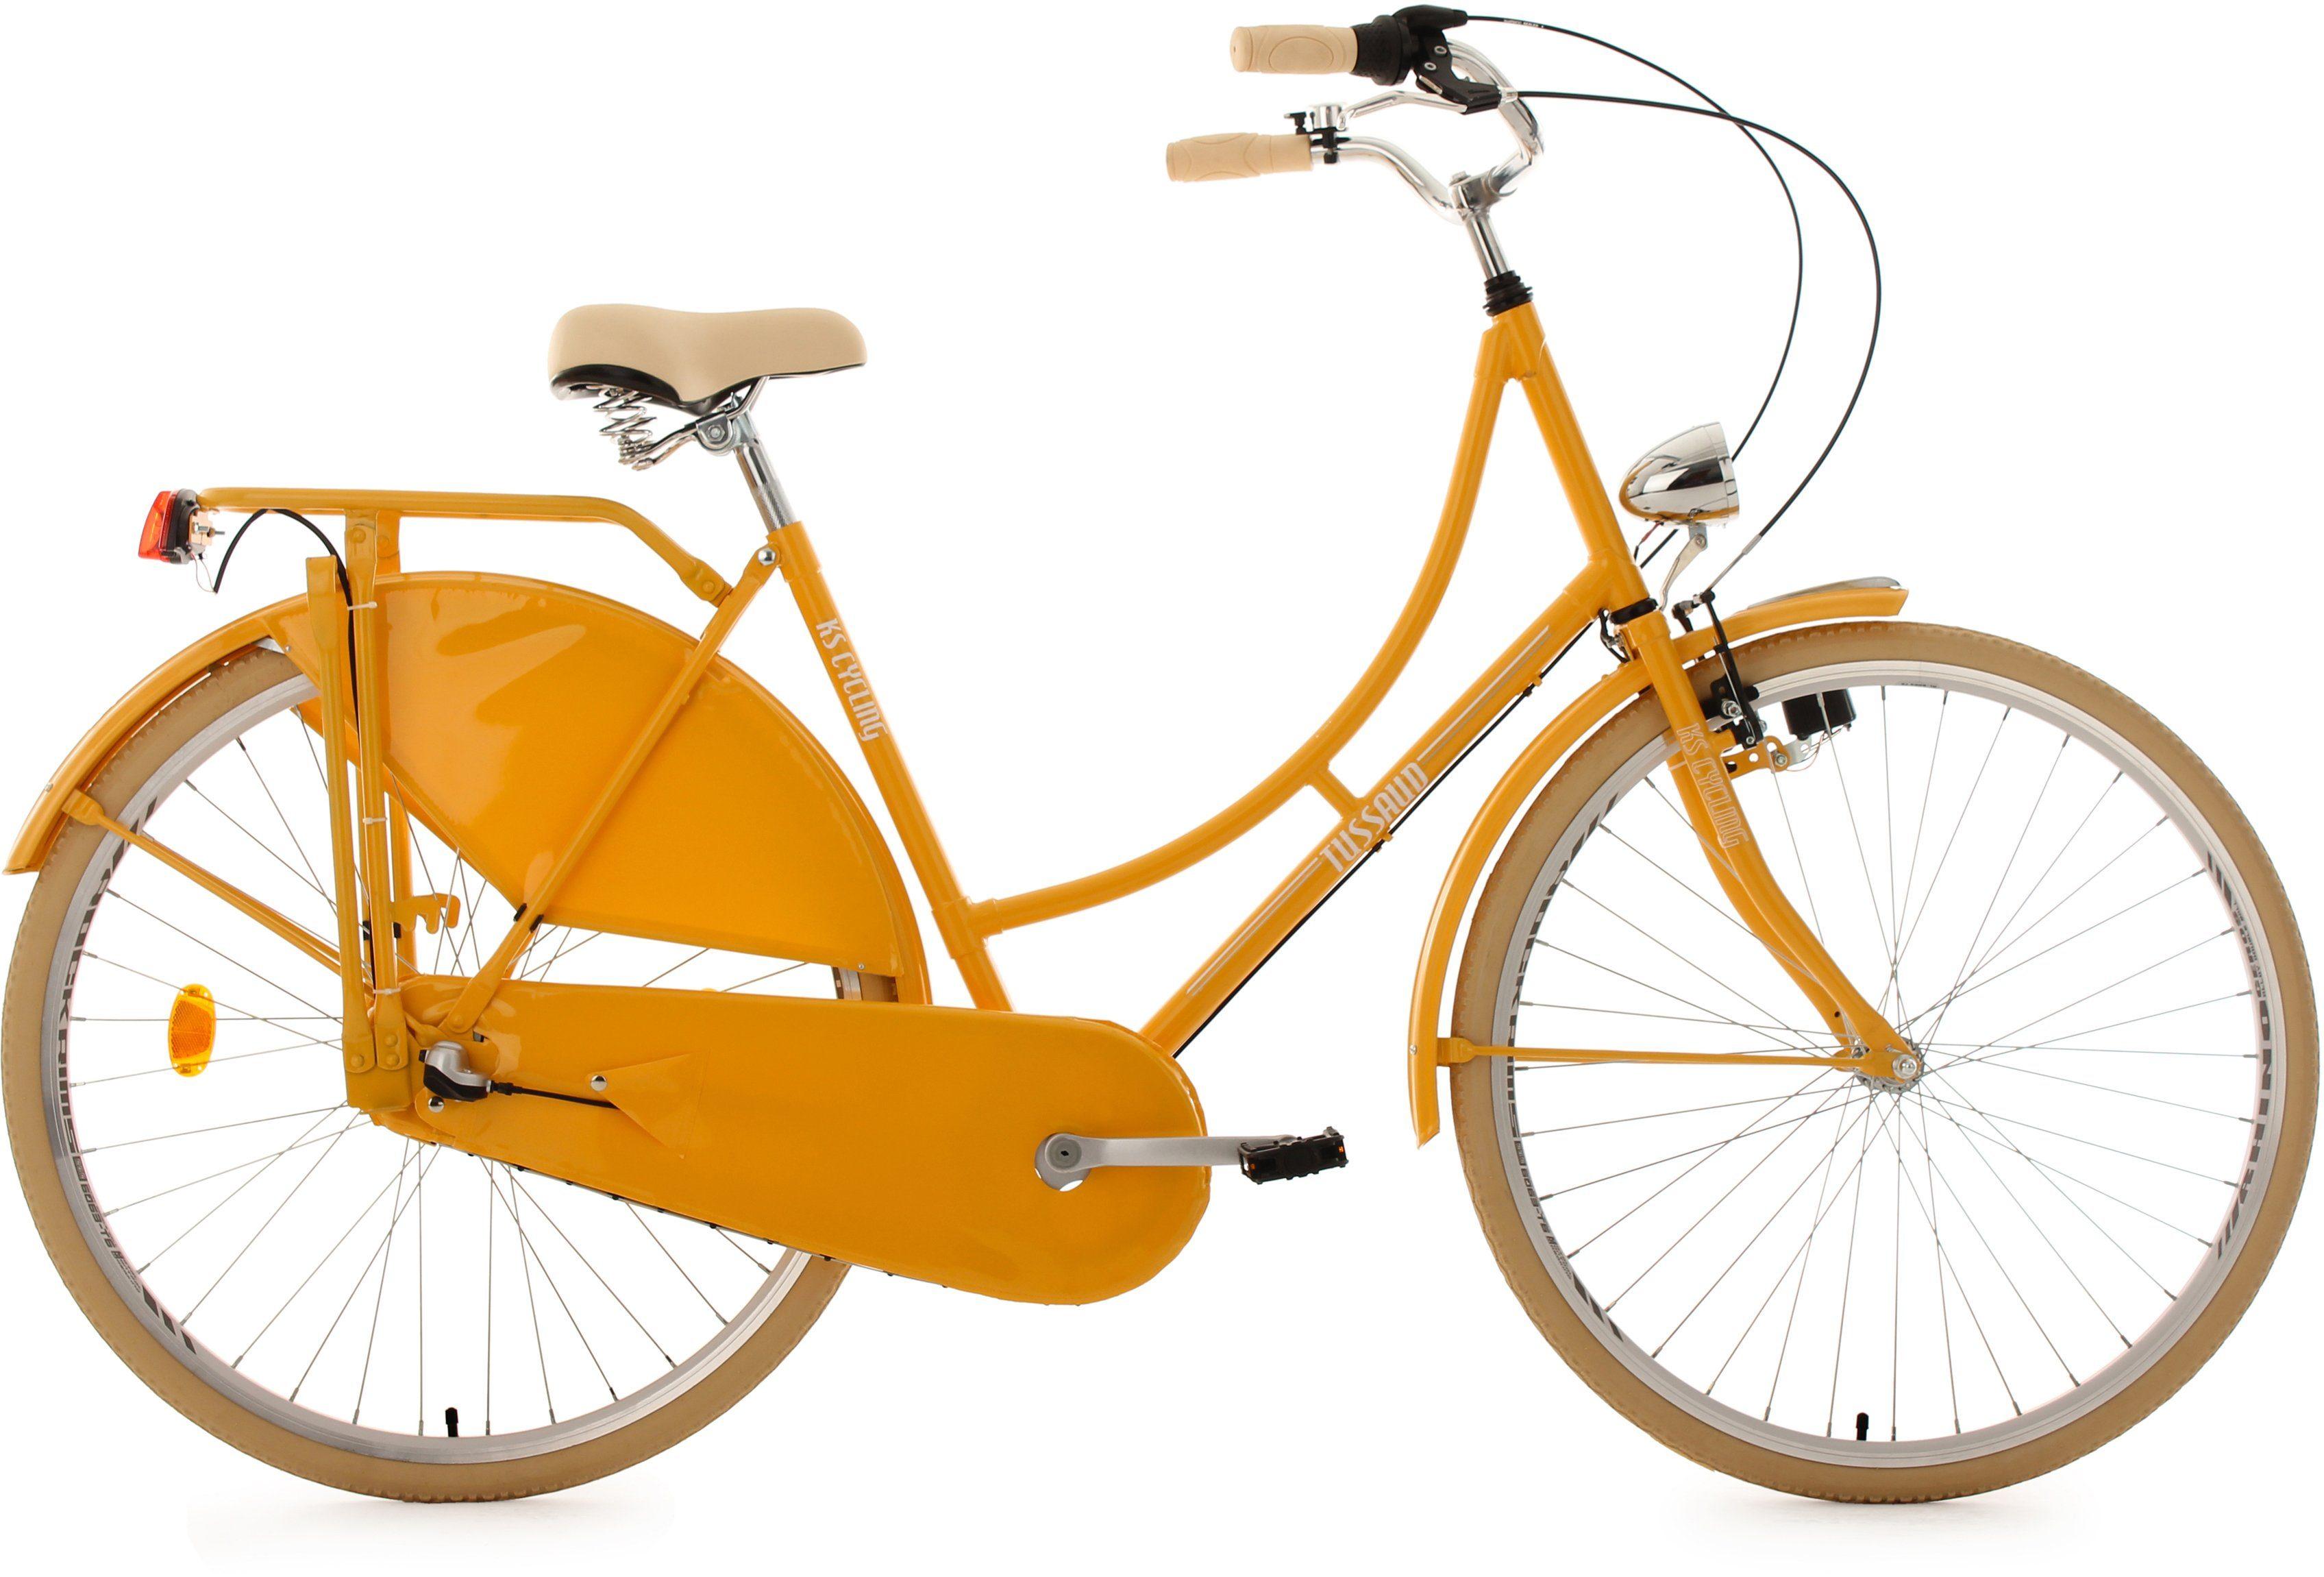 KS Cycling Hollandrad, 28 Zoll, gelb, 3-Gang-Shimano-Nexus-Nabenschaltung, »Tussaud«